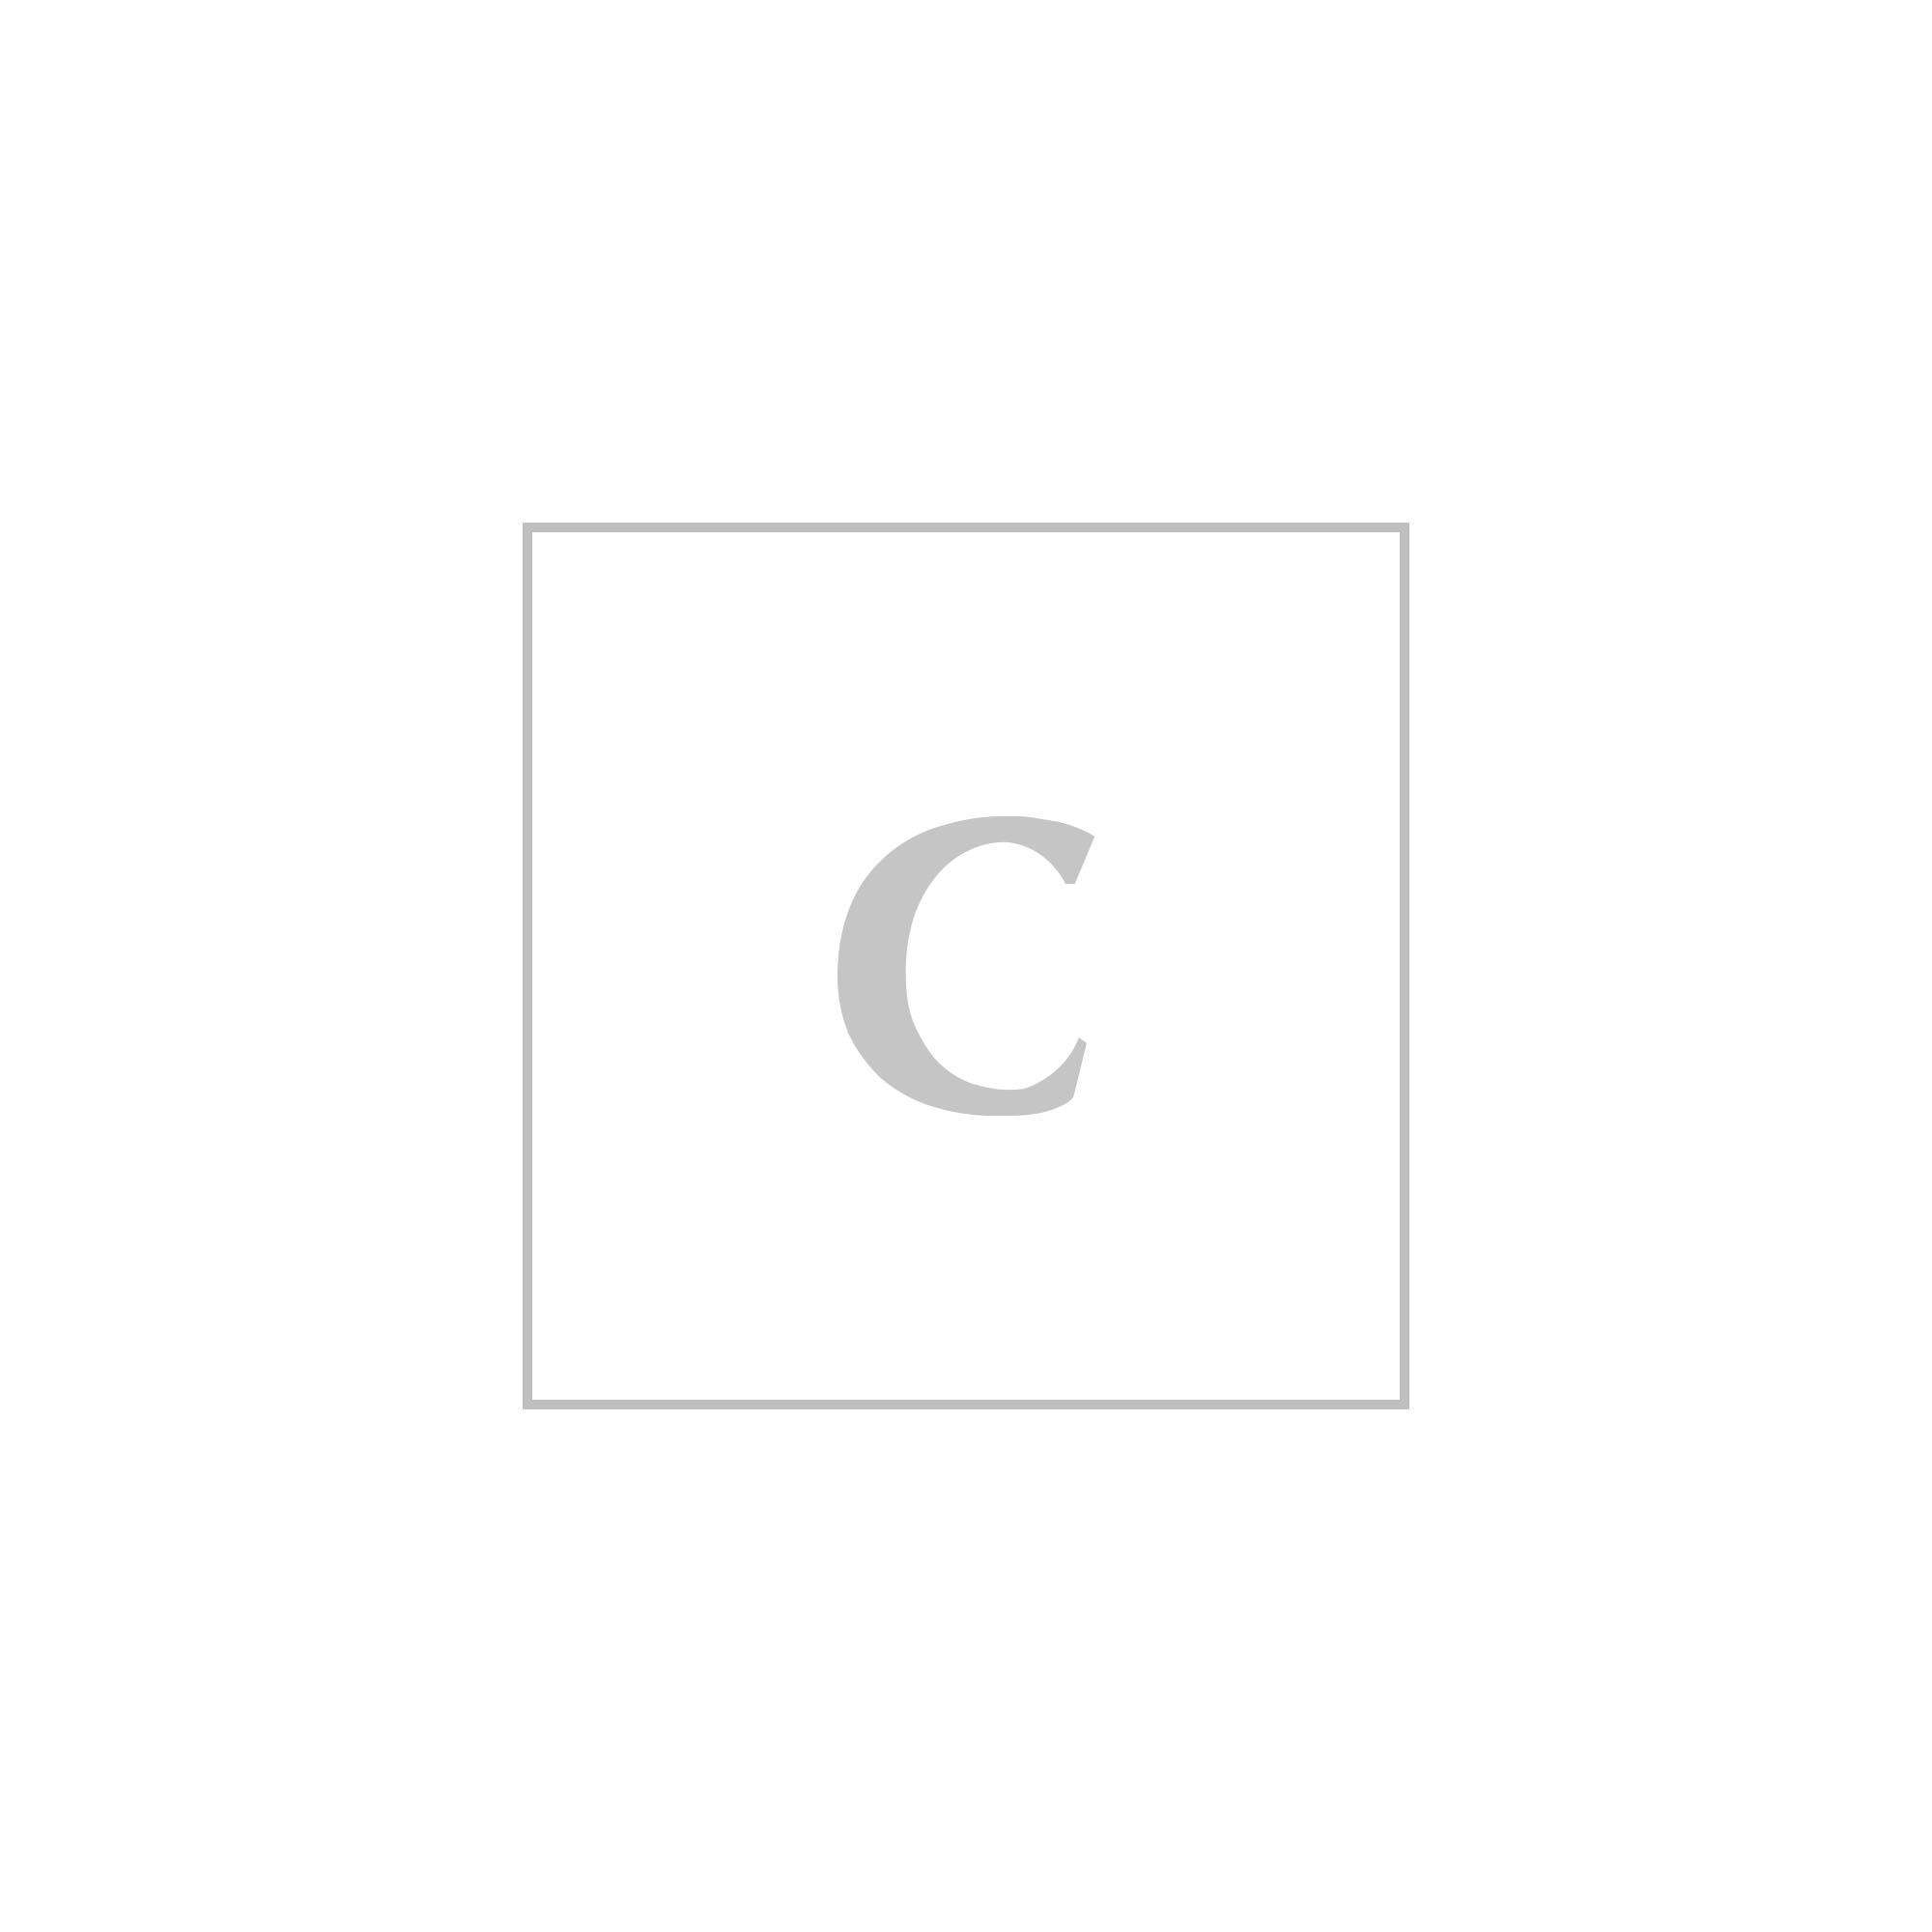 Saint laurent envelope monogram minibag